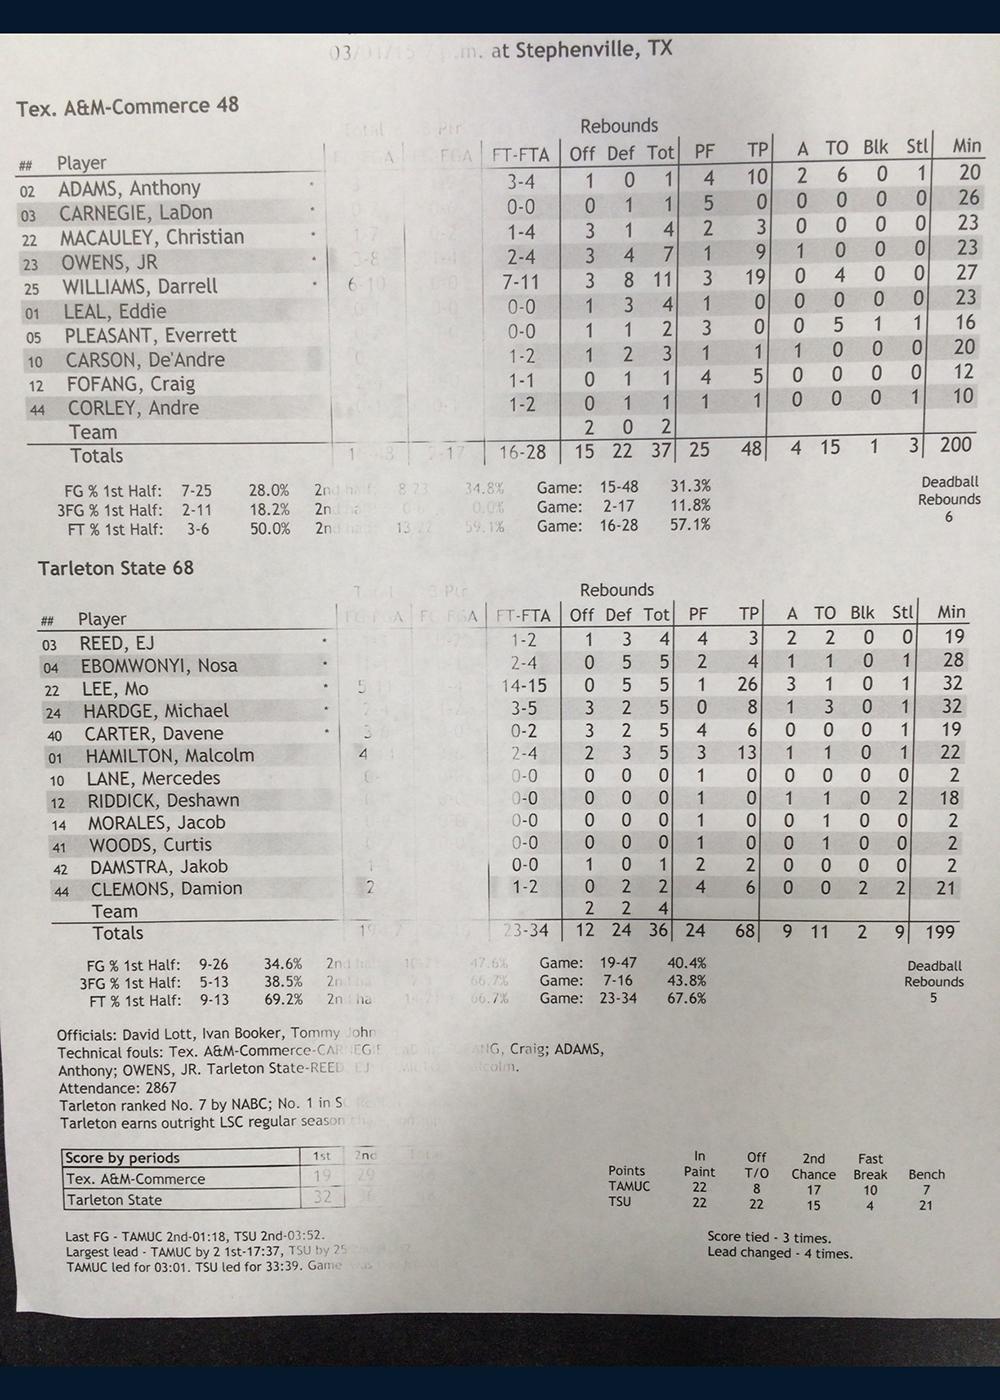 Box score from Tarleton Athletic Communications